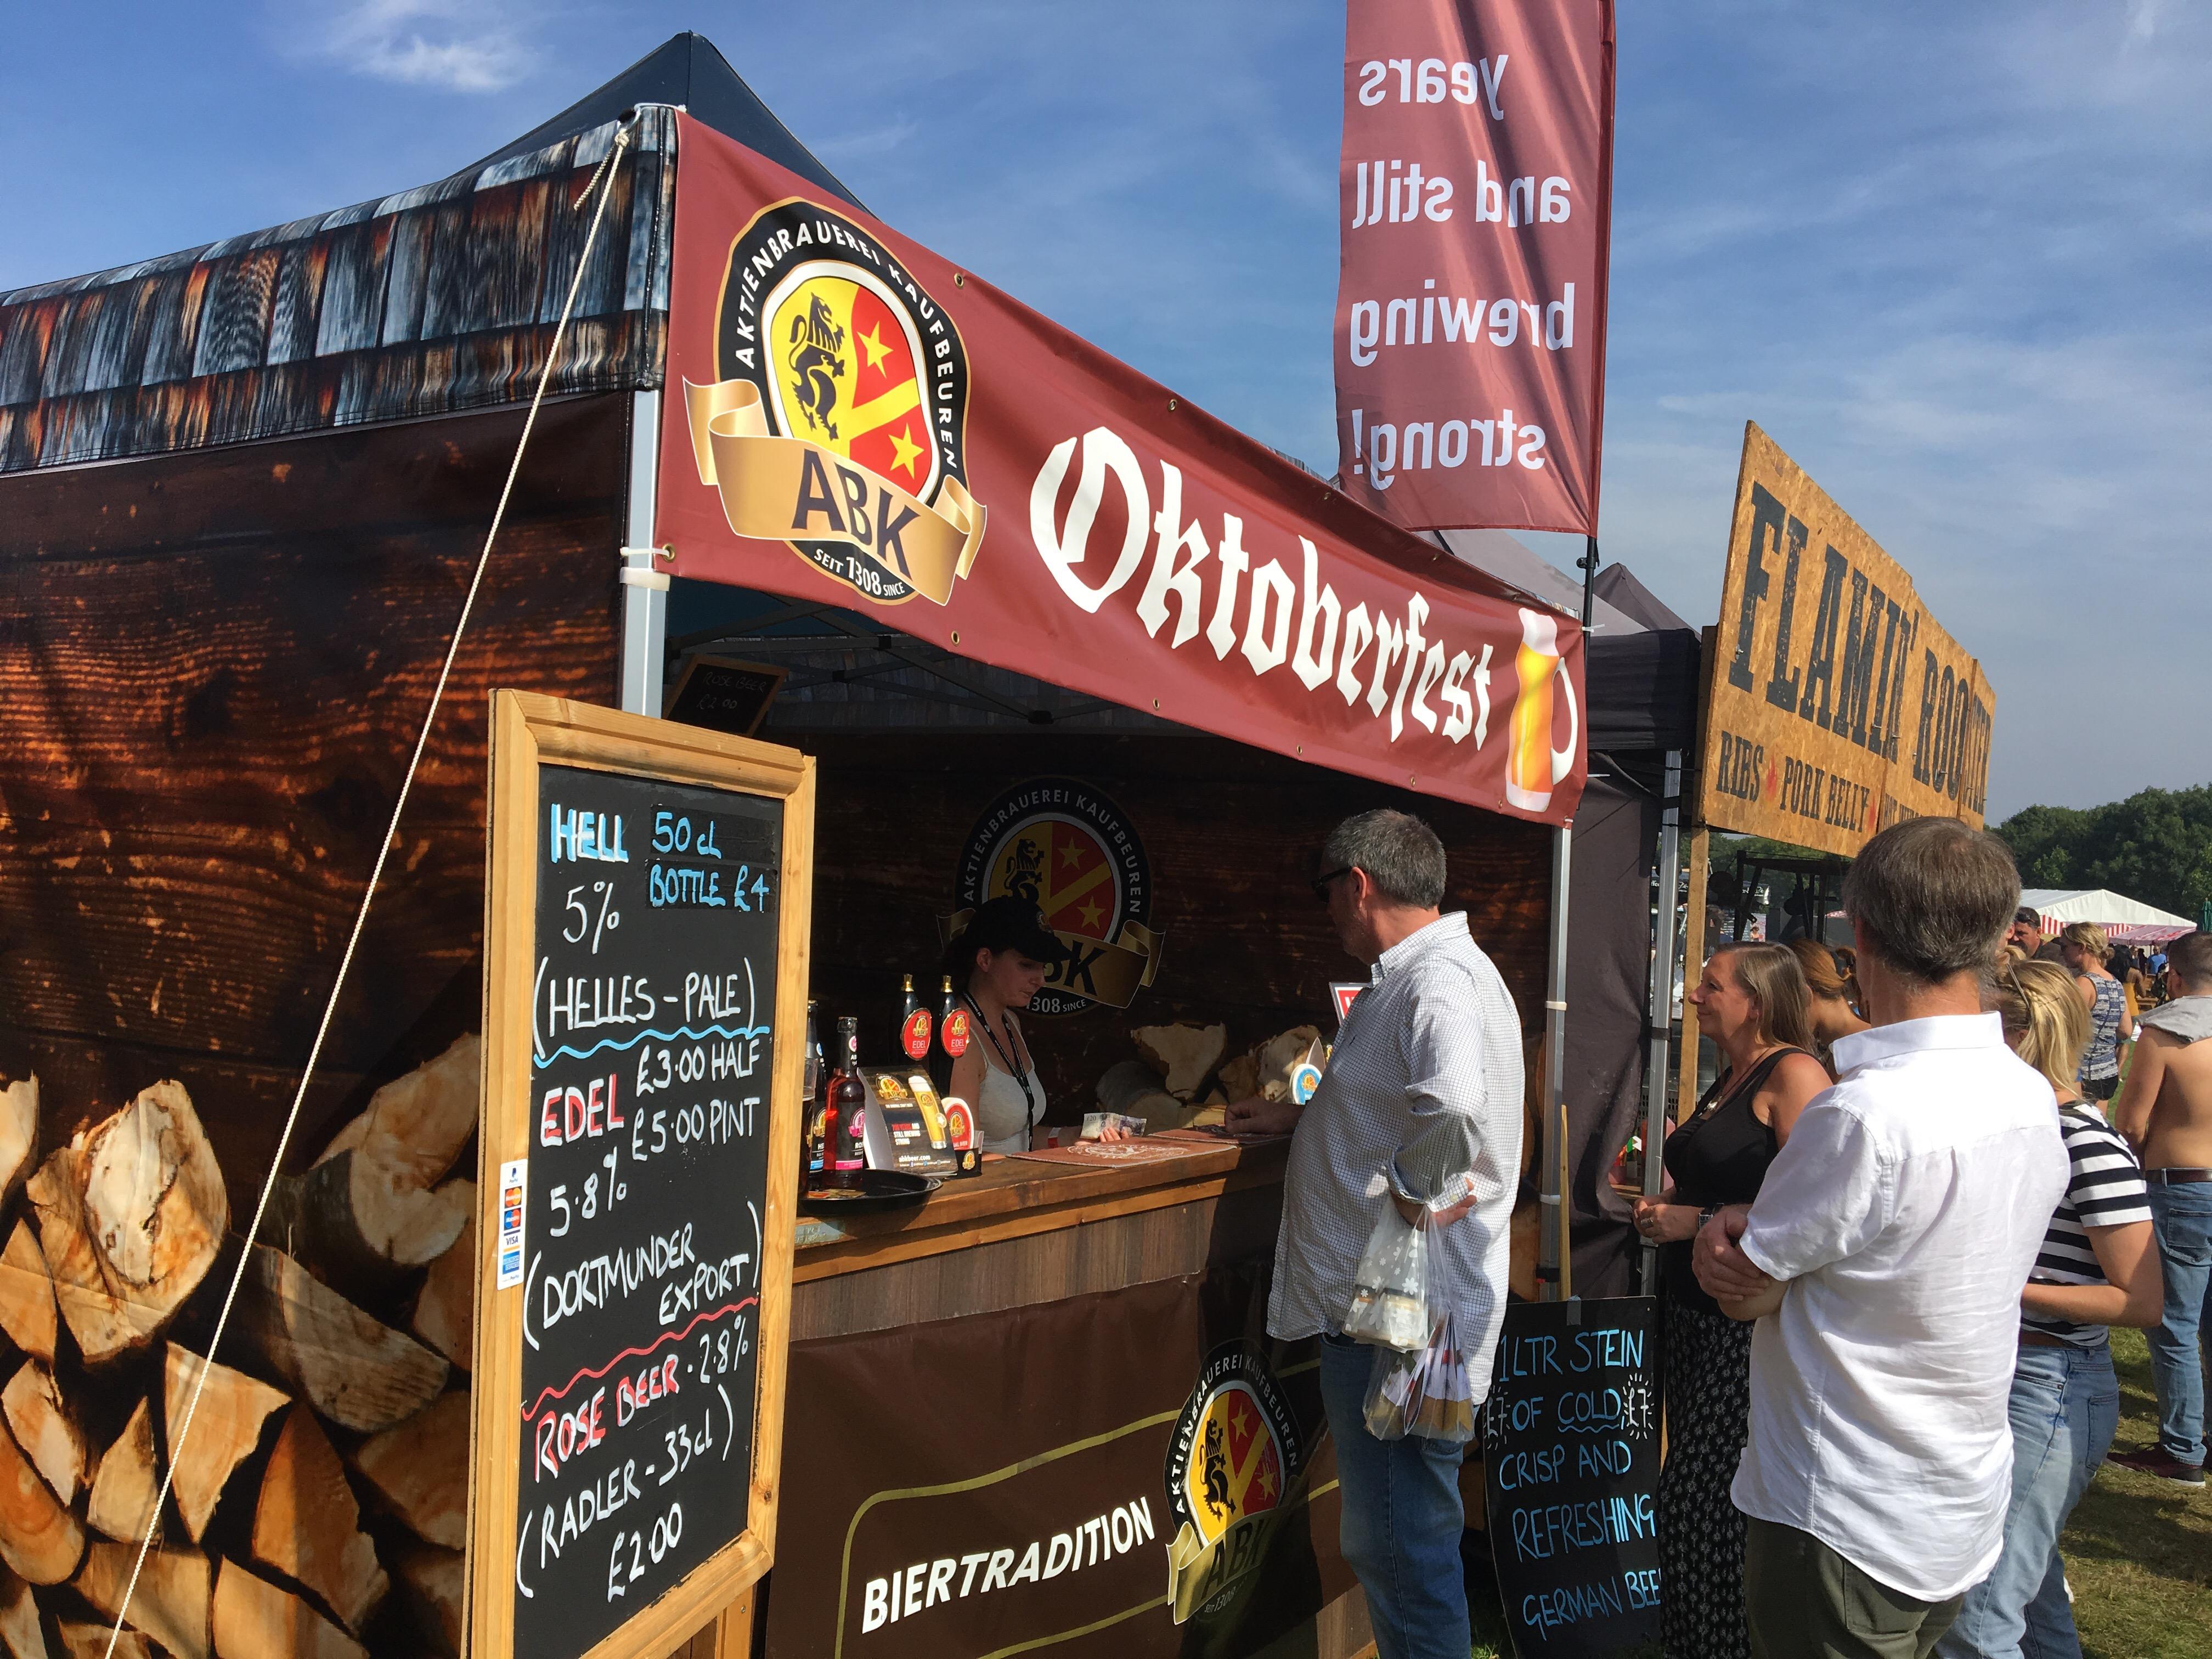 Oktoberfest stand from ABK